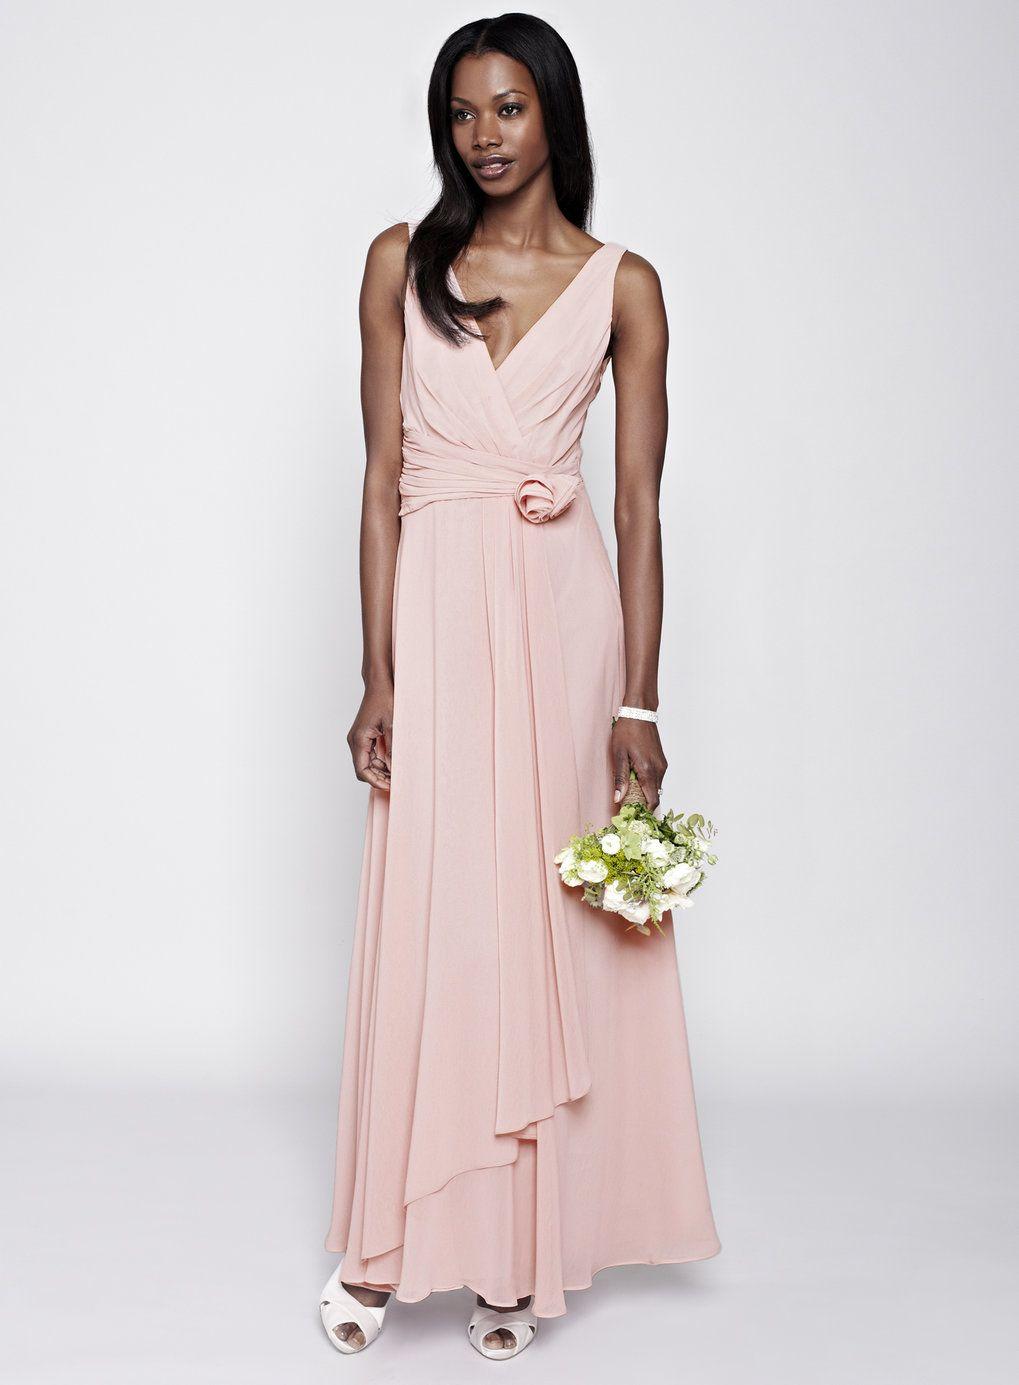 Beautiful Wedding Dresses Bhs Bridesmaids Image - Colorful Wedding ...